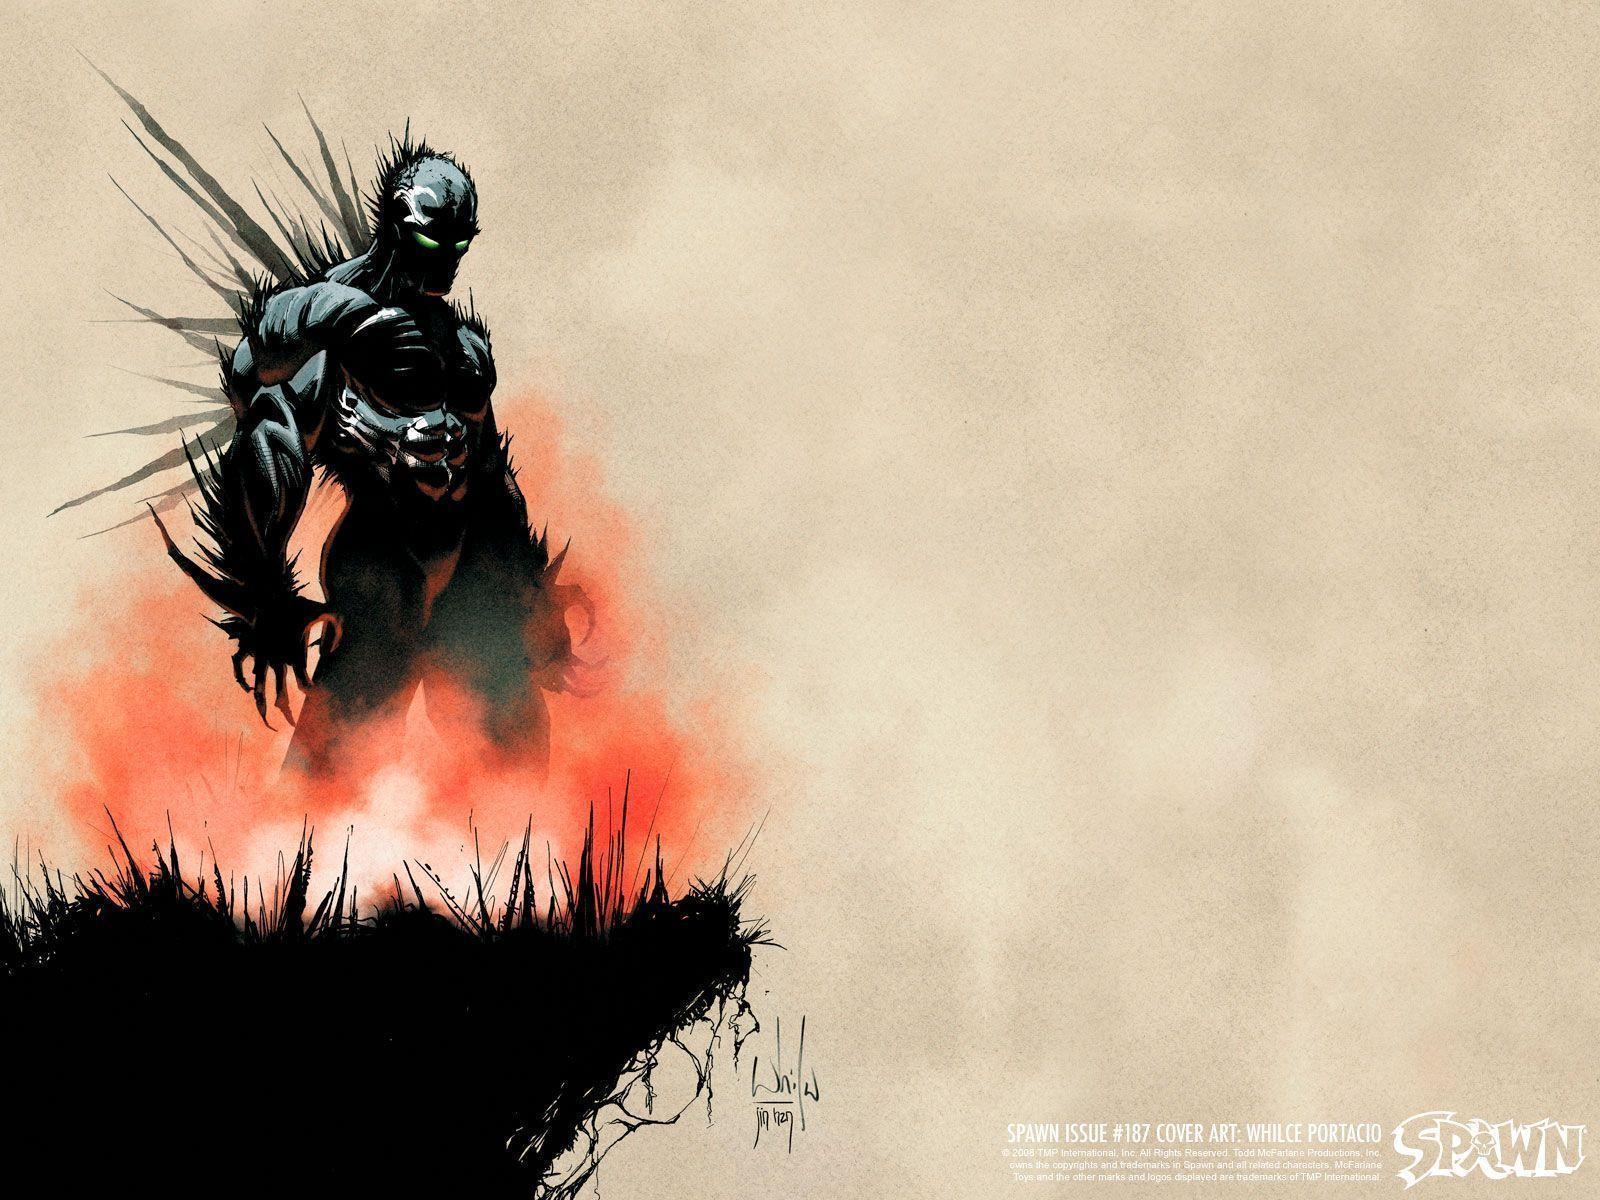 16001200 Superhero From Hell Spawn Comics WallpapersVol02